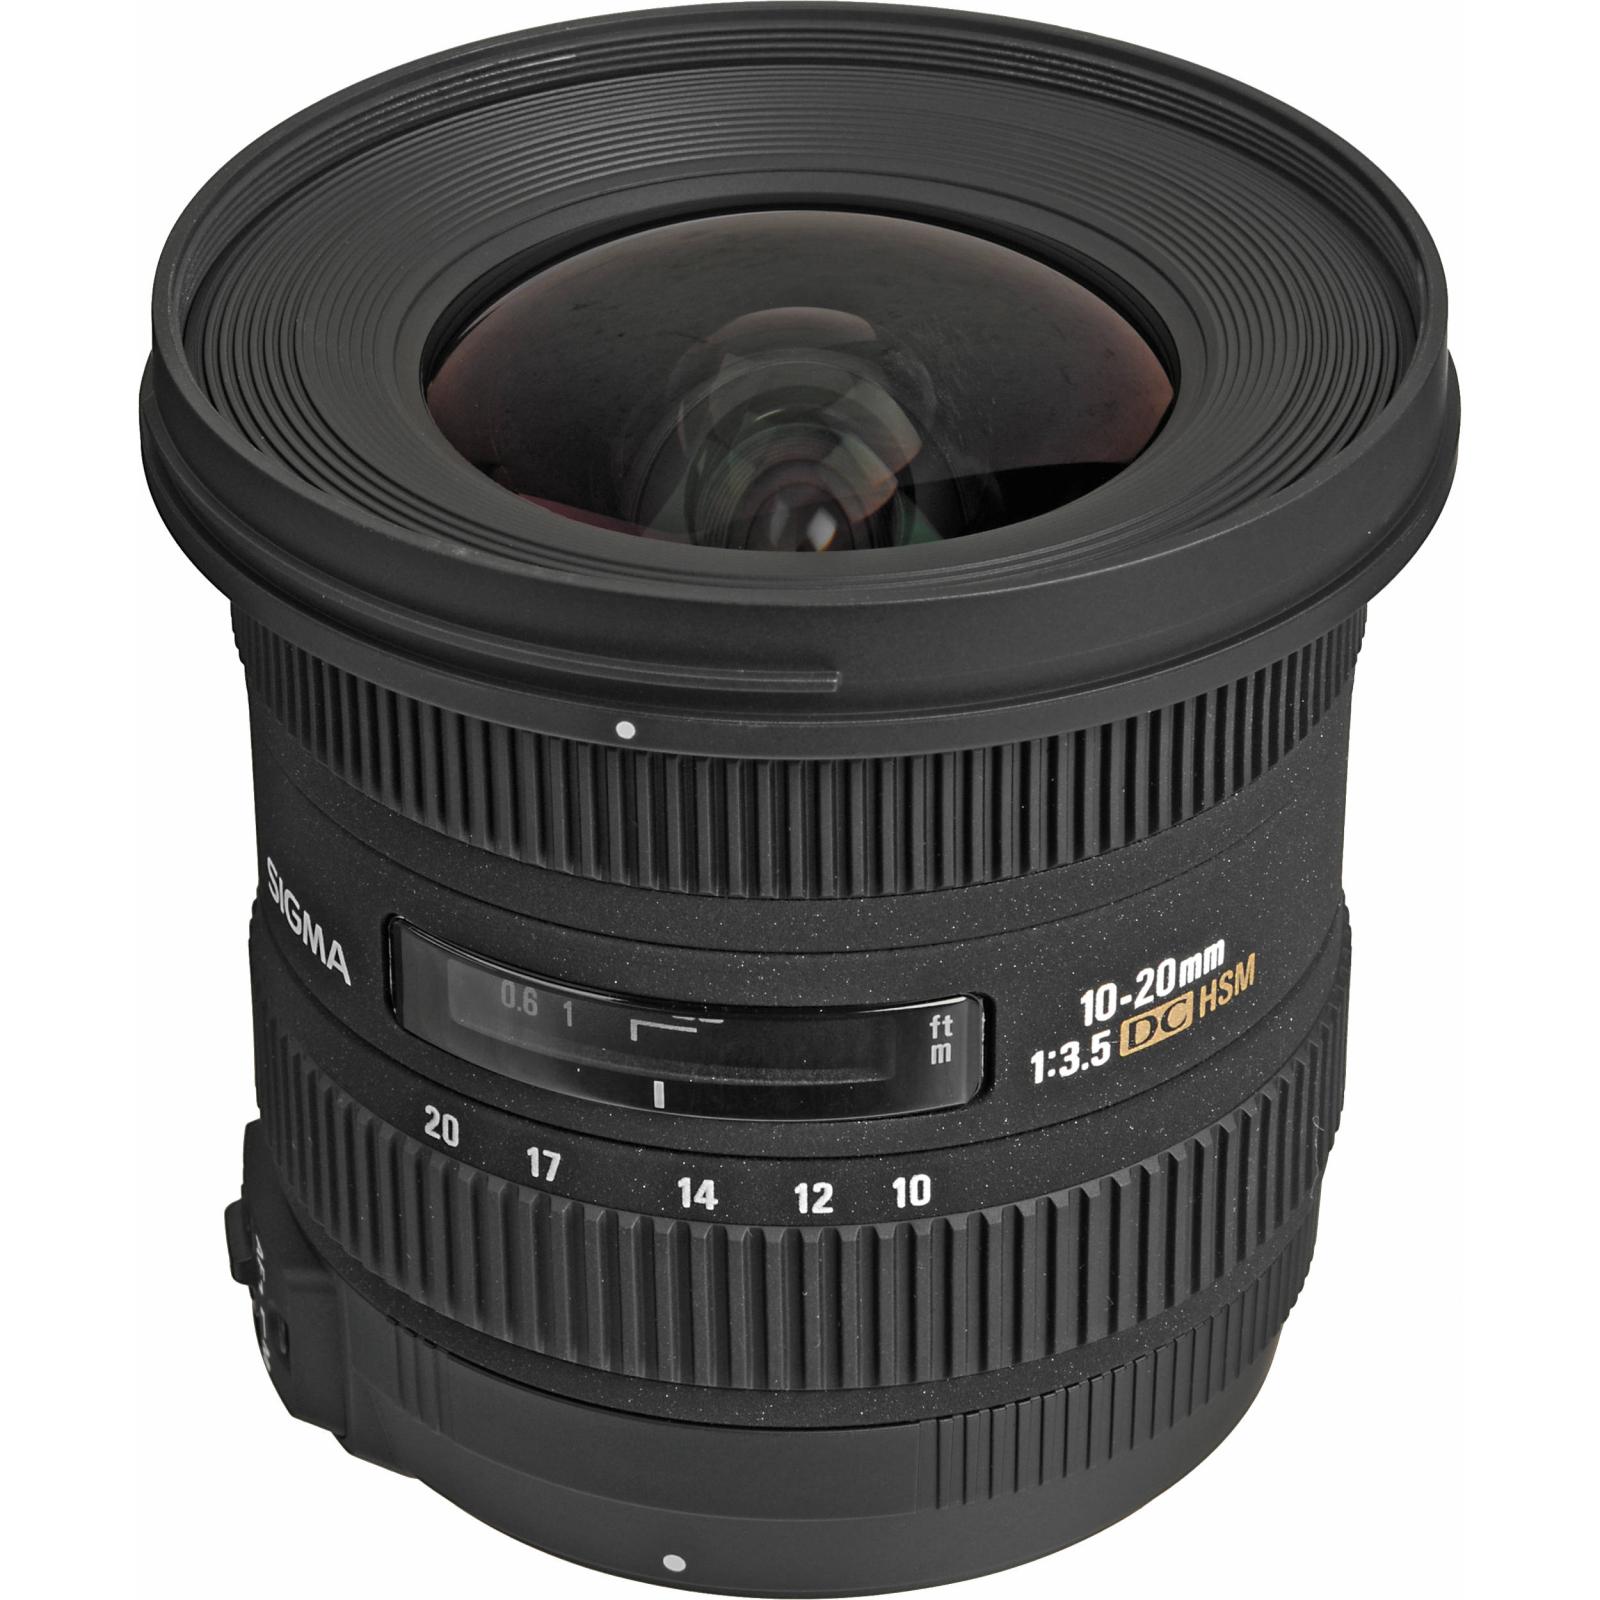 Объектив Sigma 10-20mm/3.5 EX DC HSM Canon (202954) изображение 3